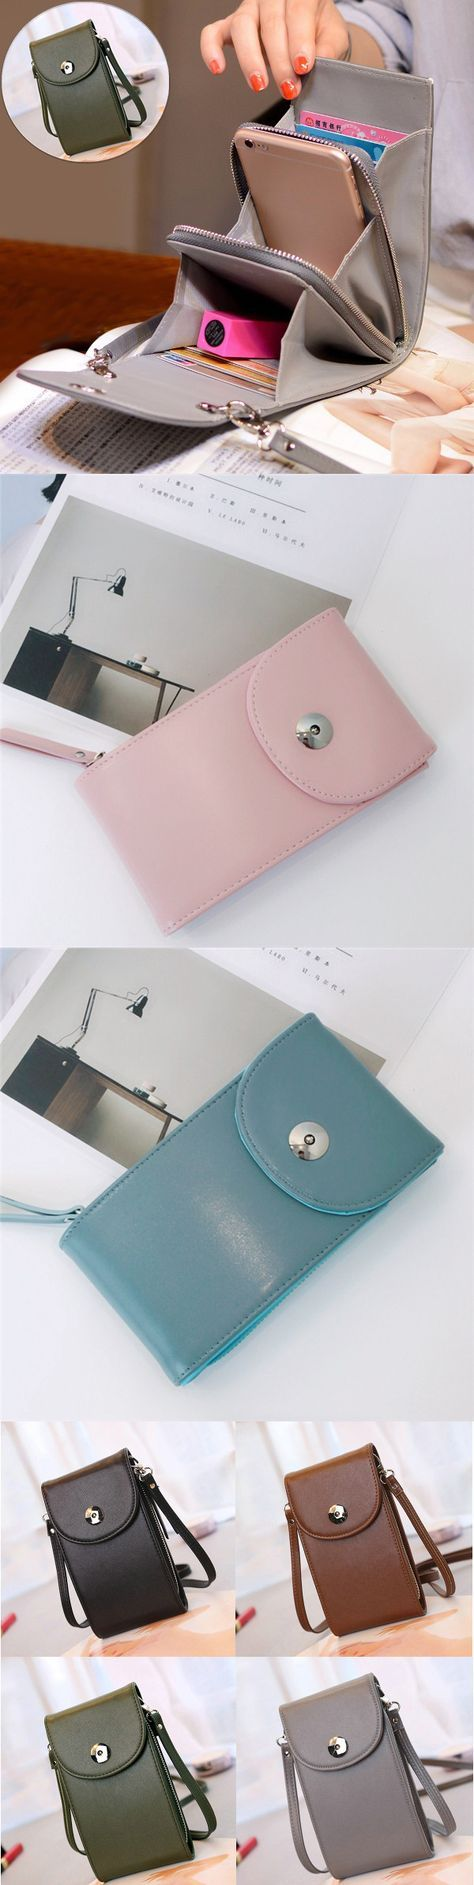 [$ 19.76] Vintage PU Leather Universal 6inch Shoulder Phone Bag For iPhone Samsu… – Amy Retzlaff